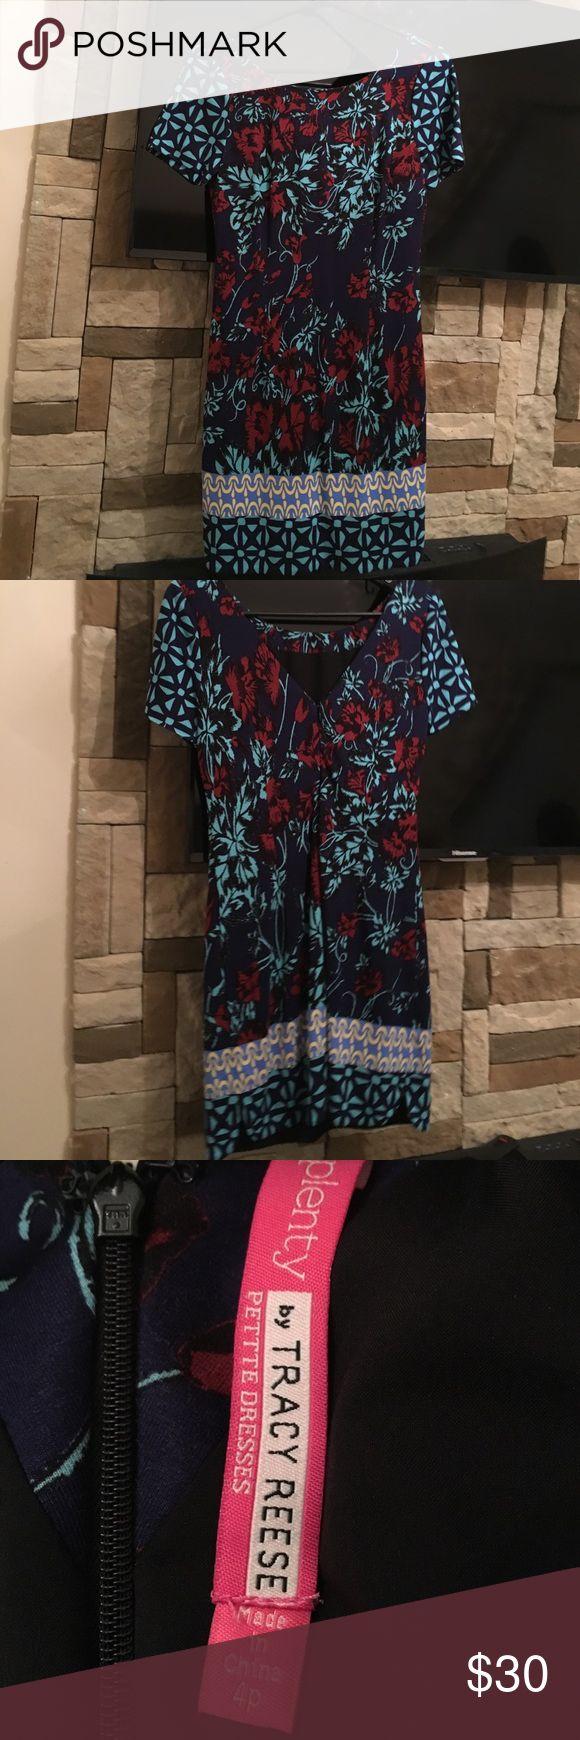 NWOT Anthropology Dress NWOT Anthropologie Dresses